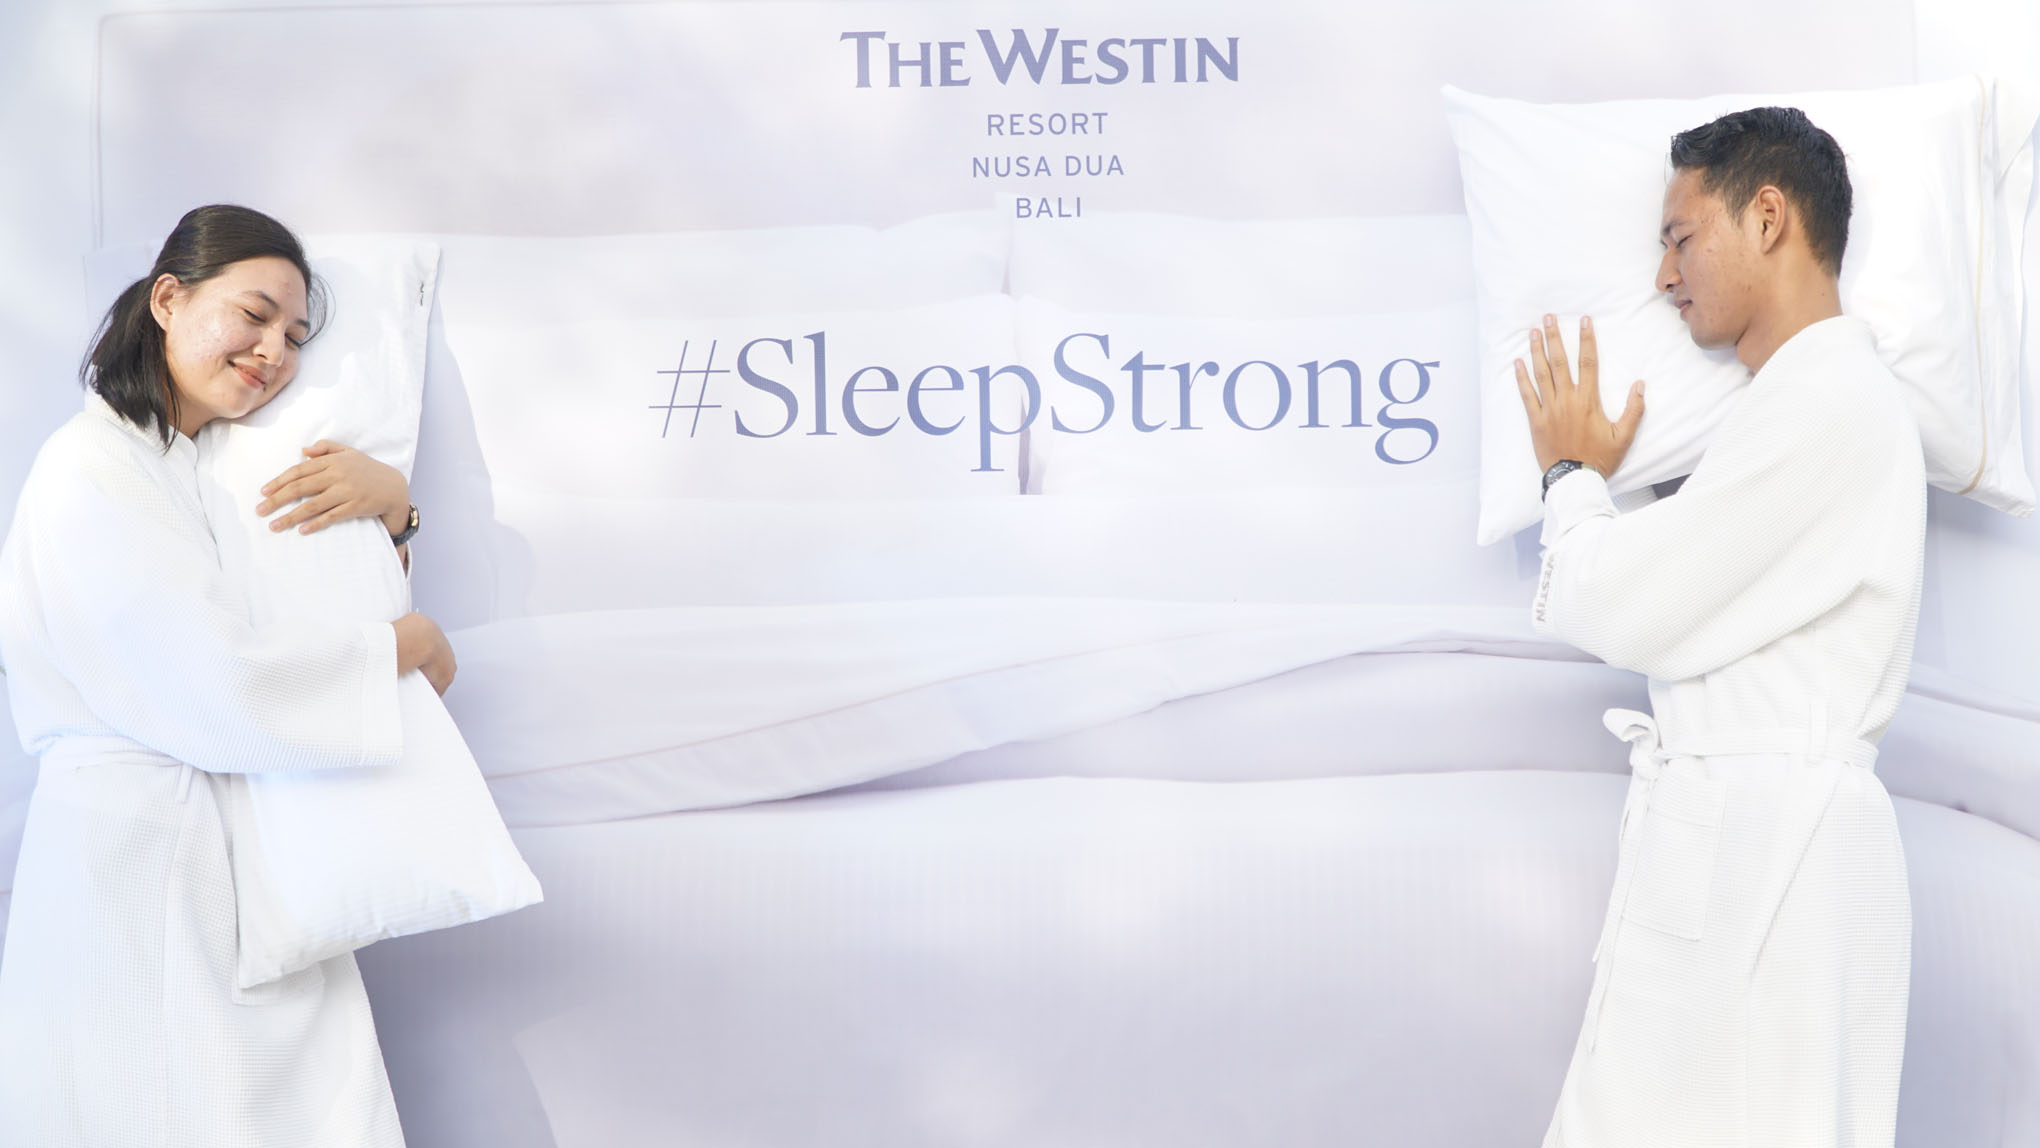 The Westin Resort Nusa Dua Rayakan Hari Tidur Sedunia